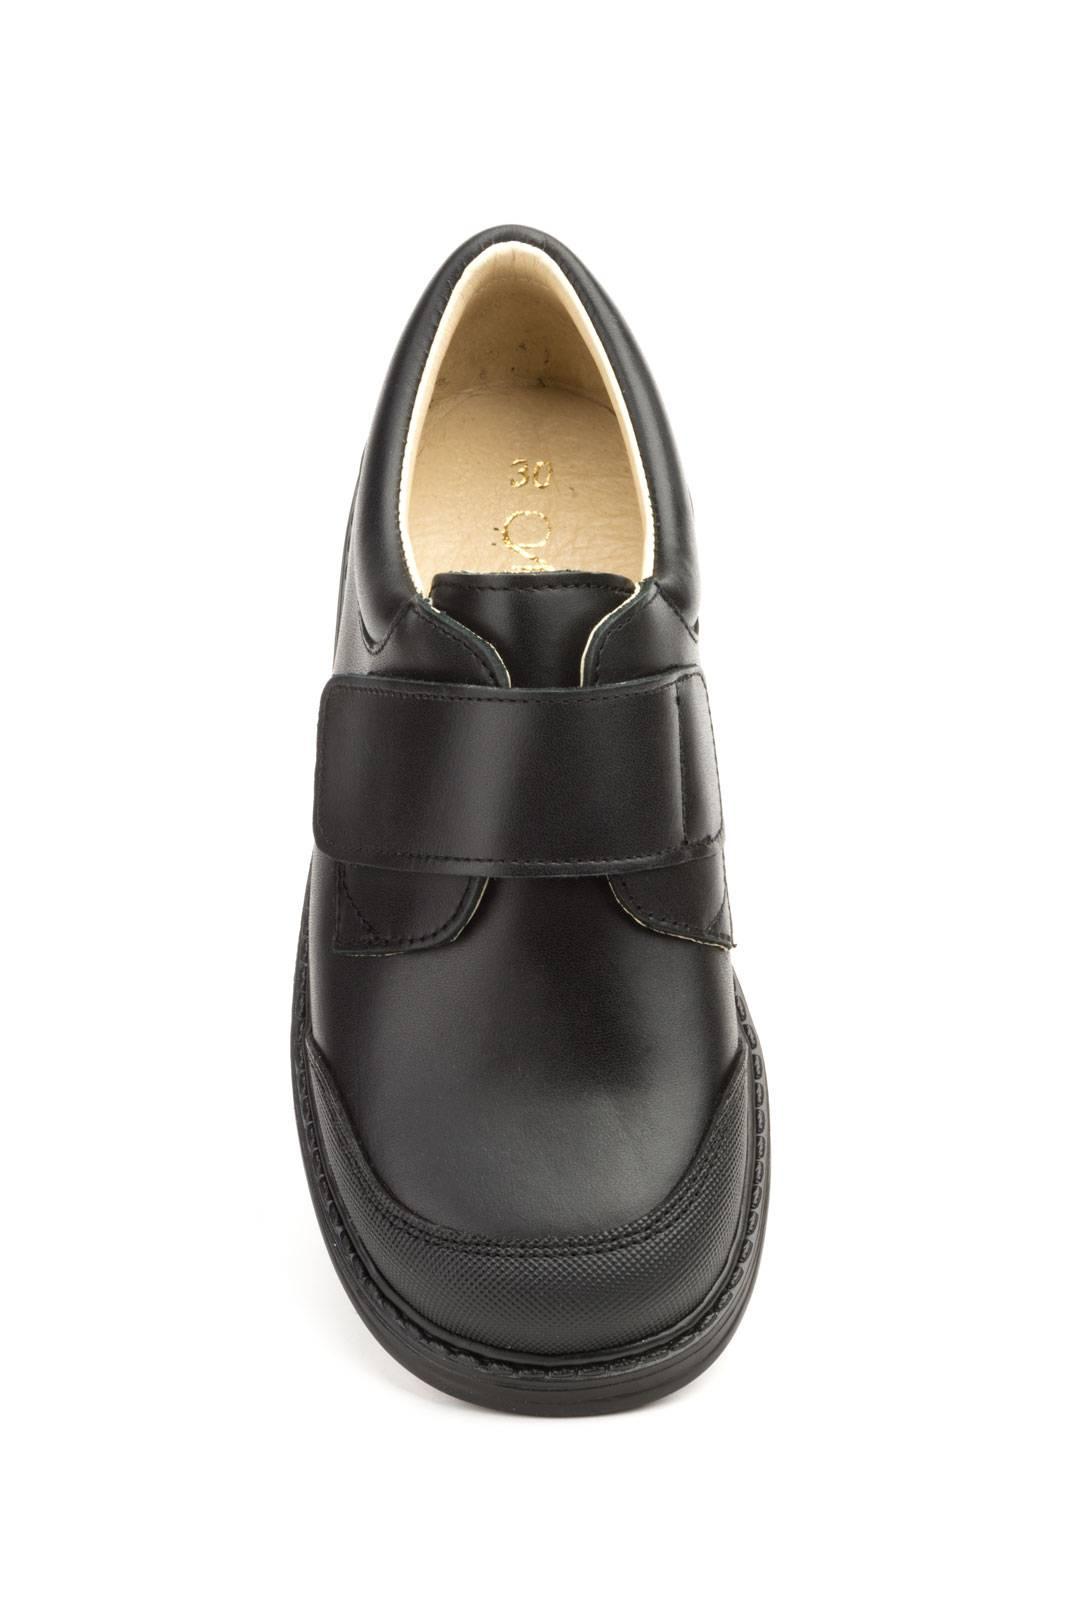 Zapatos Colegial Velcro Niño Cierre Piel Negro nwxWpzRw8q 4972d7d0133